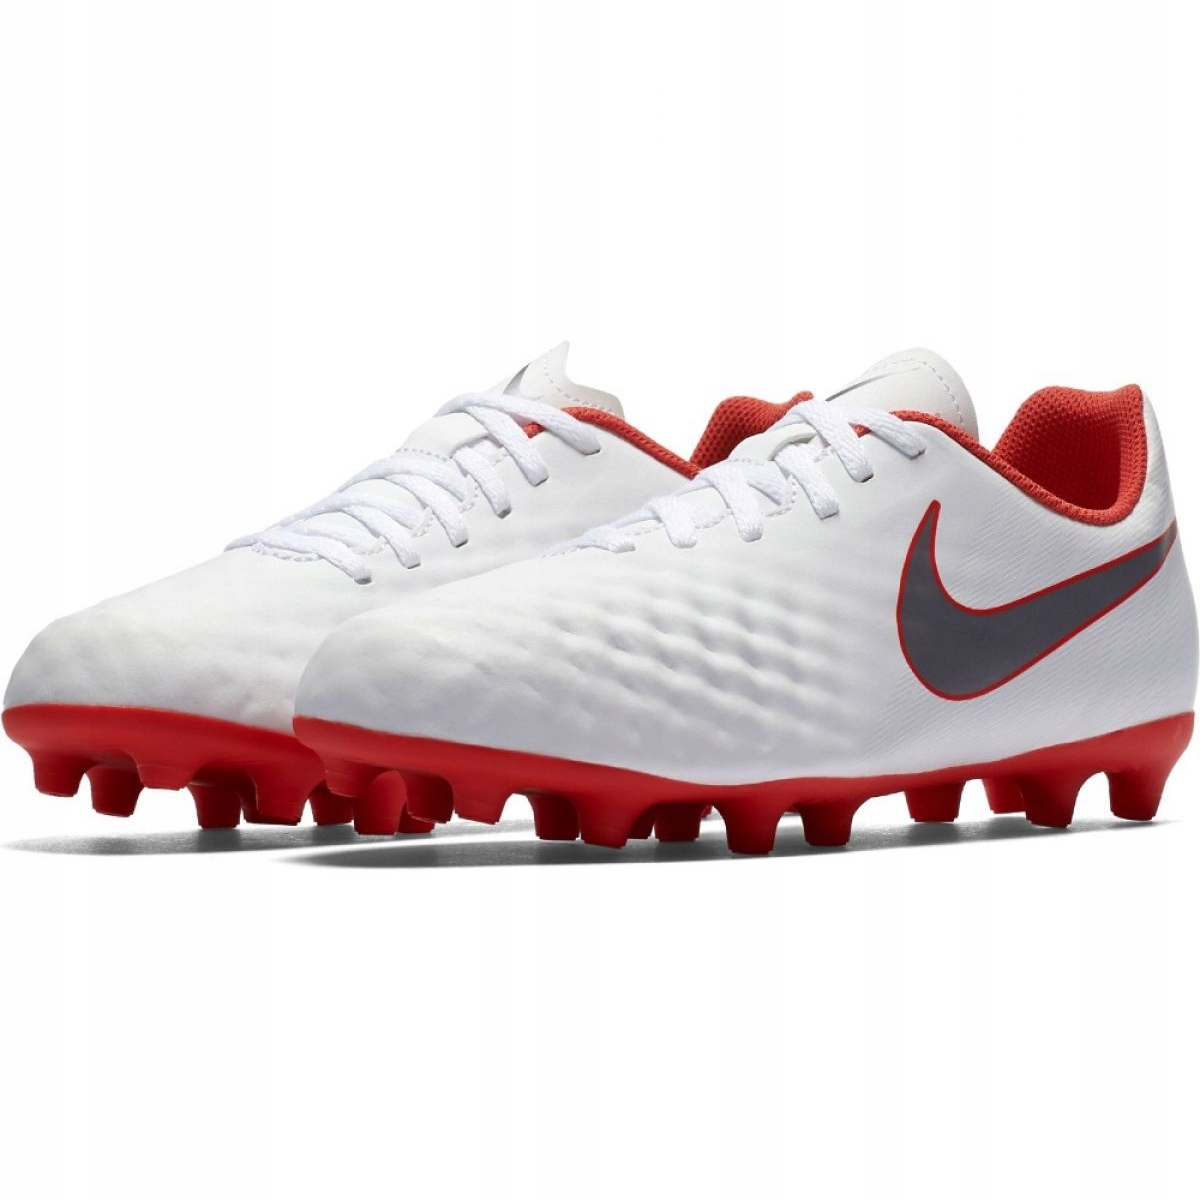 Nike Obra 3 Academy DF MG, Scarpe da Calcio Unisex Adulto